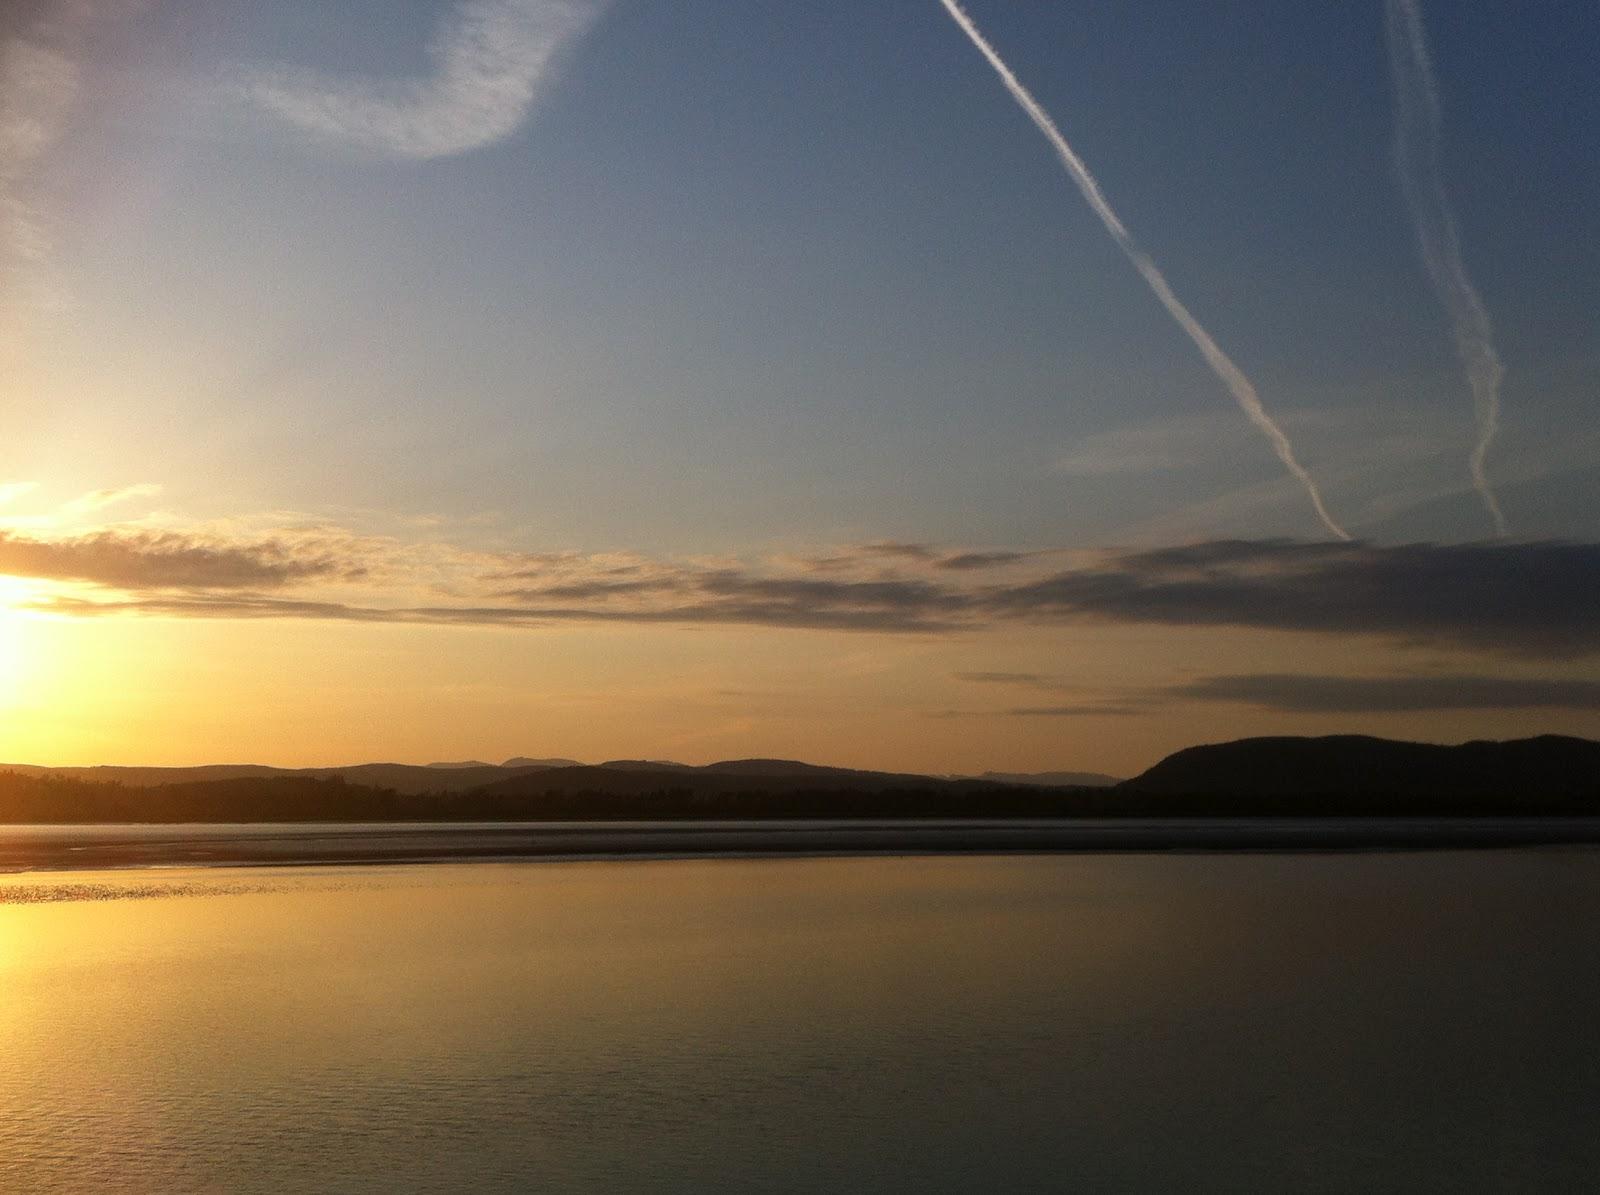 http://2.bp.blogspot.com/-3PujGChFWj8/UECgbQUQ9nI/AAAAAAAABZY/HT20HM1C0-0/s1600/Arnside+Sunset.JPG